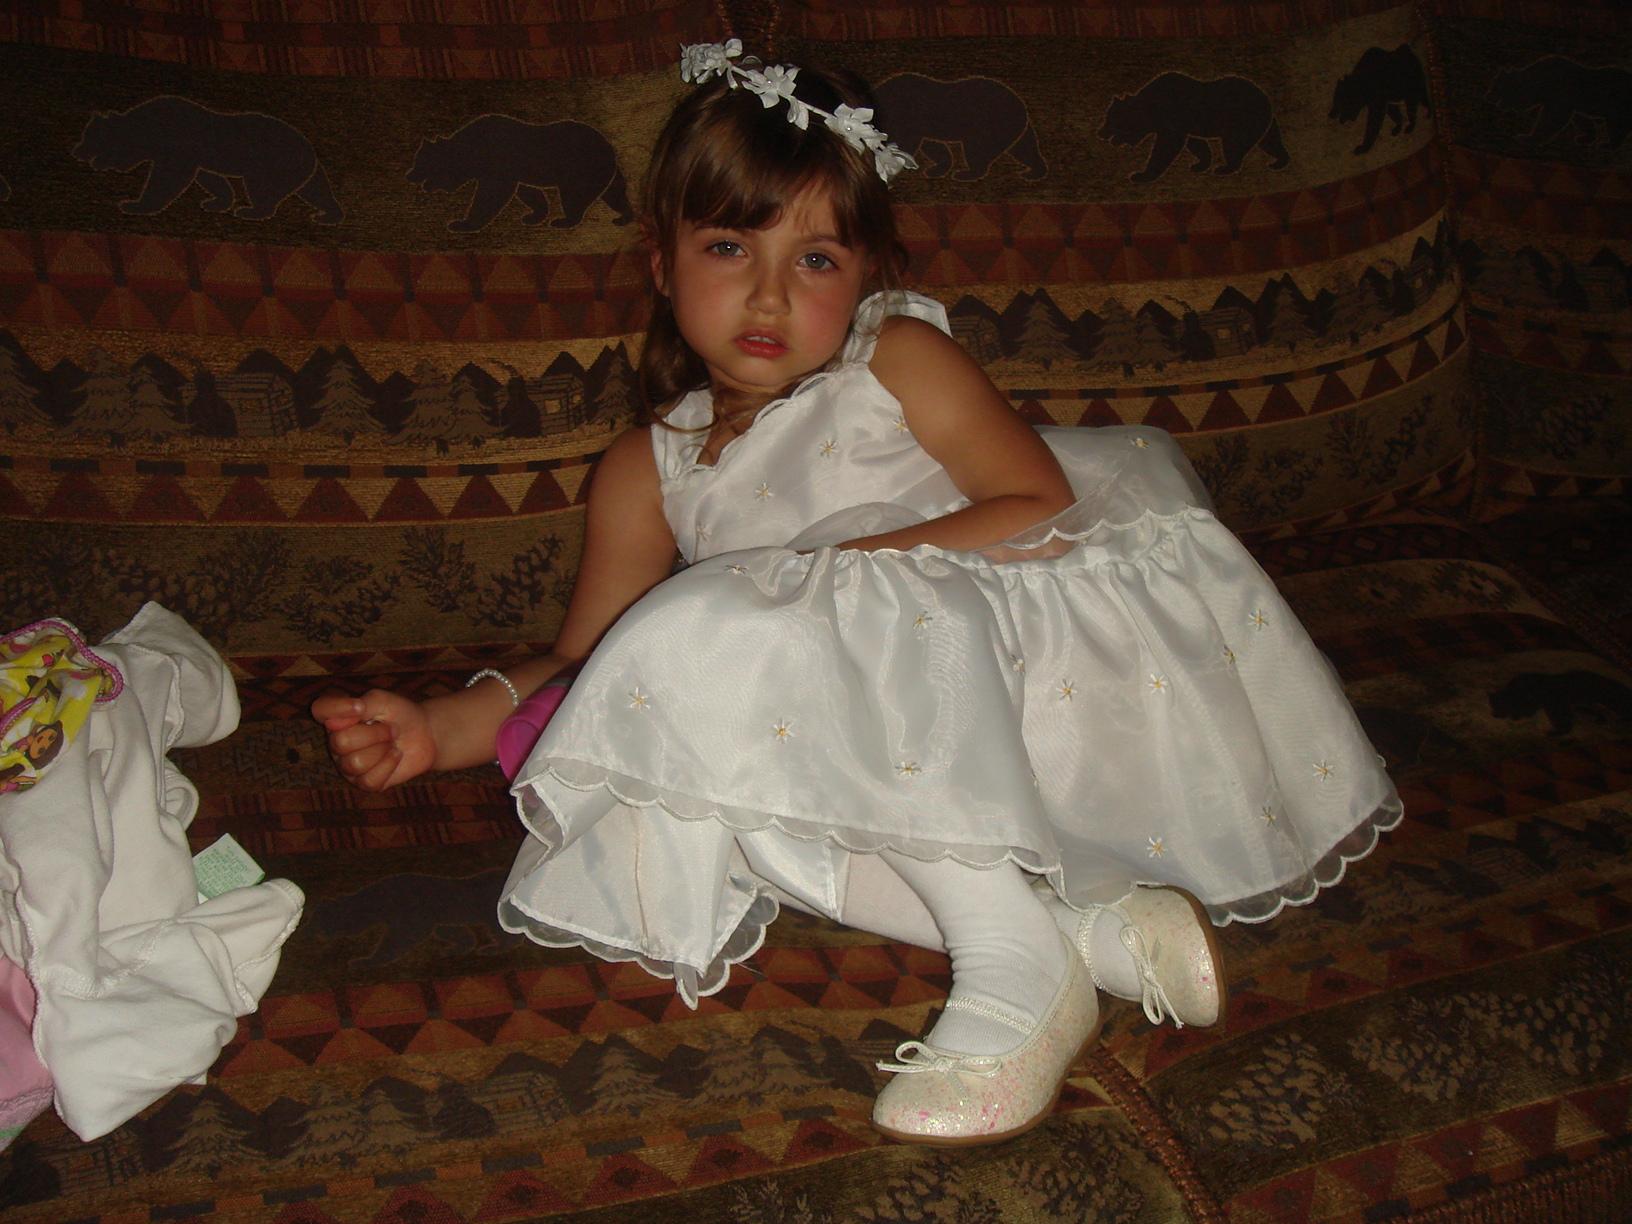 Mike's fiance's daughter, Olivia, flower girl